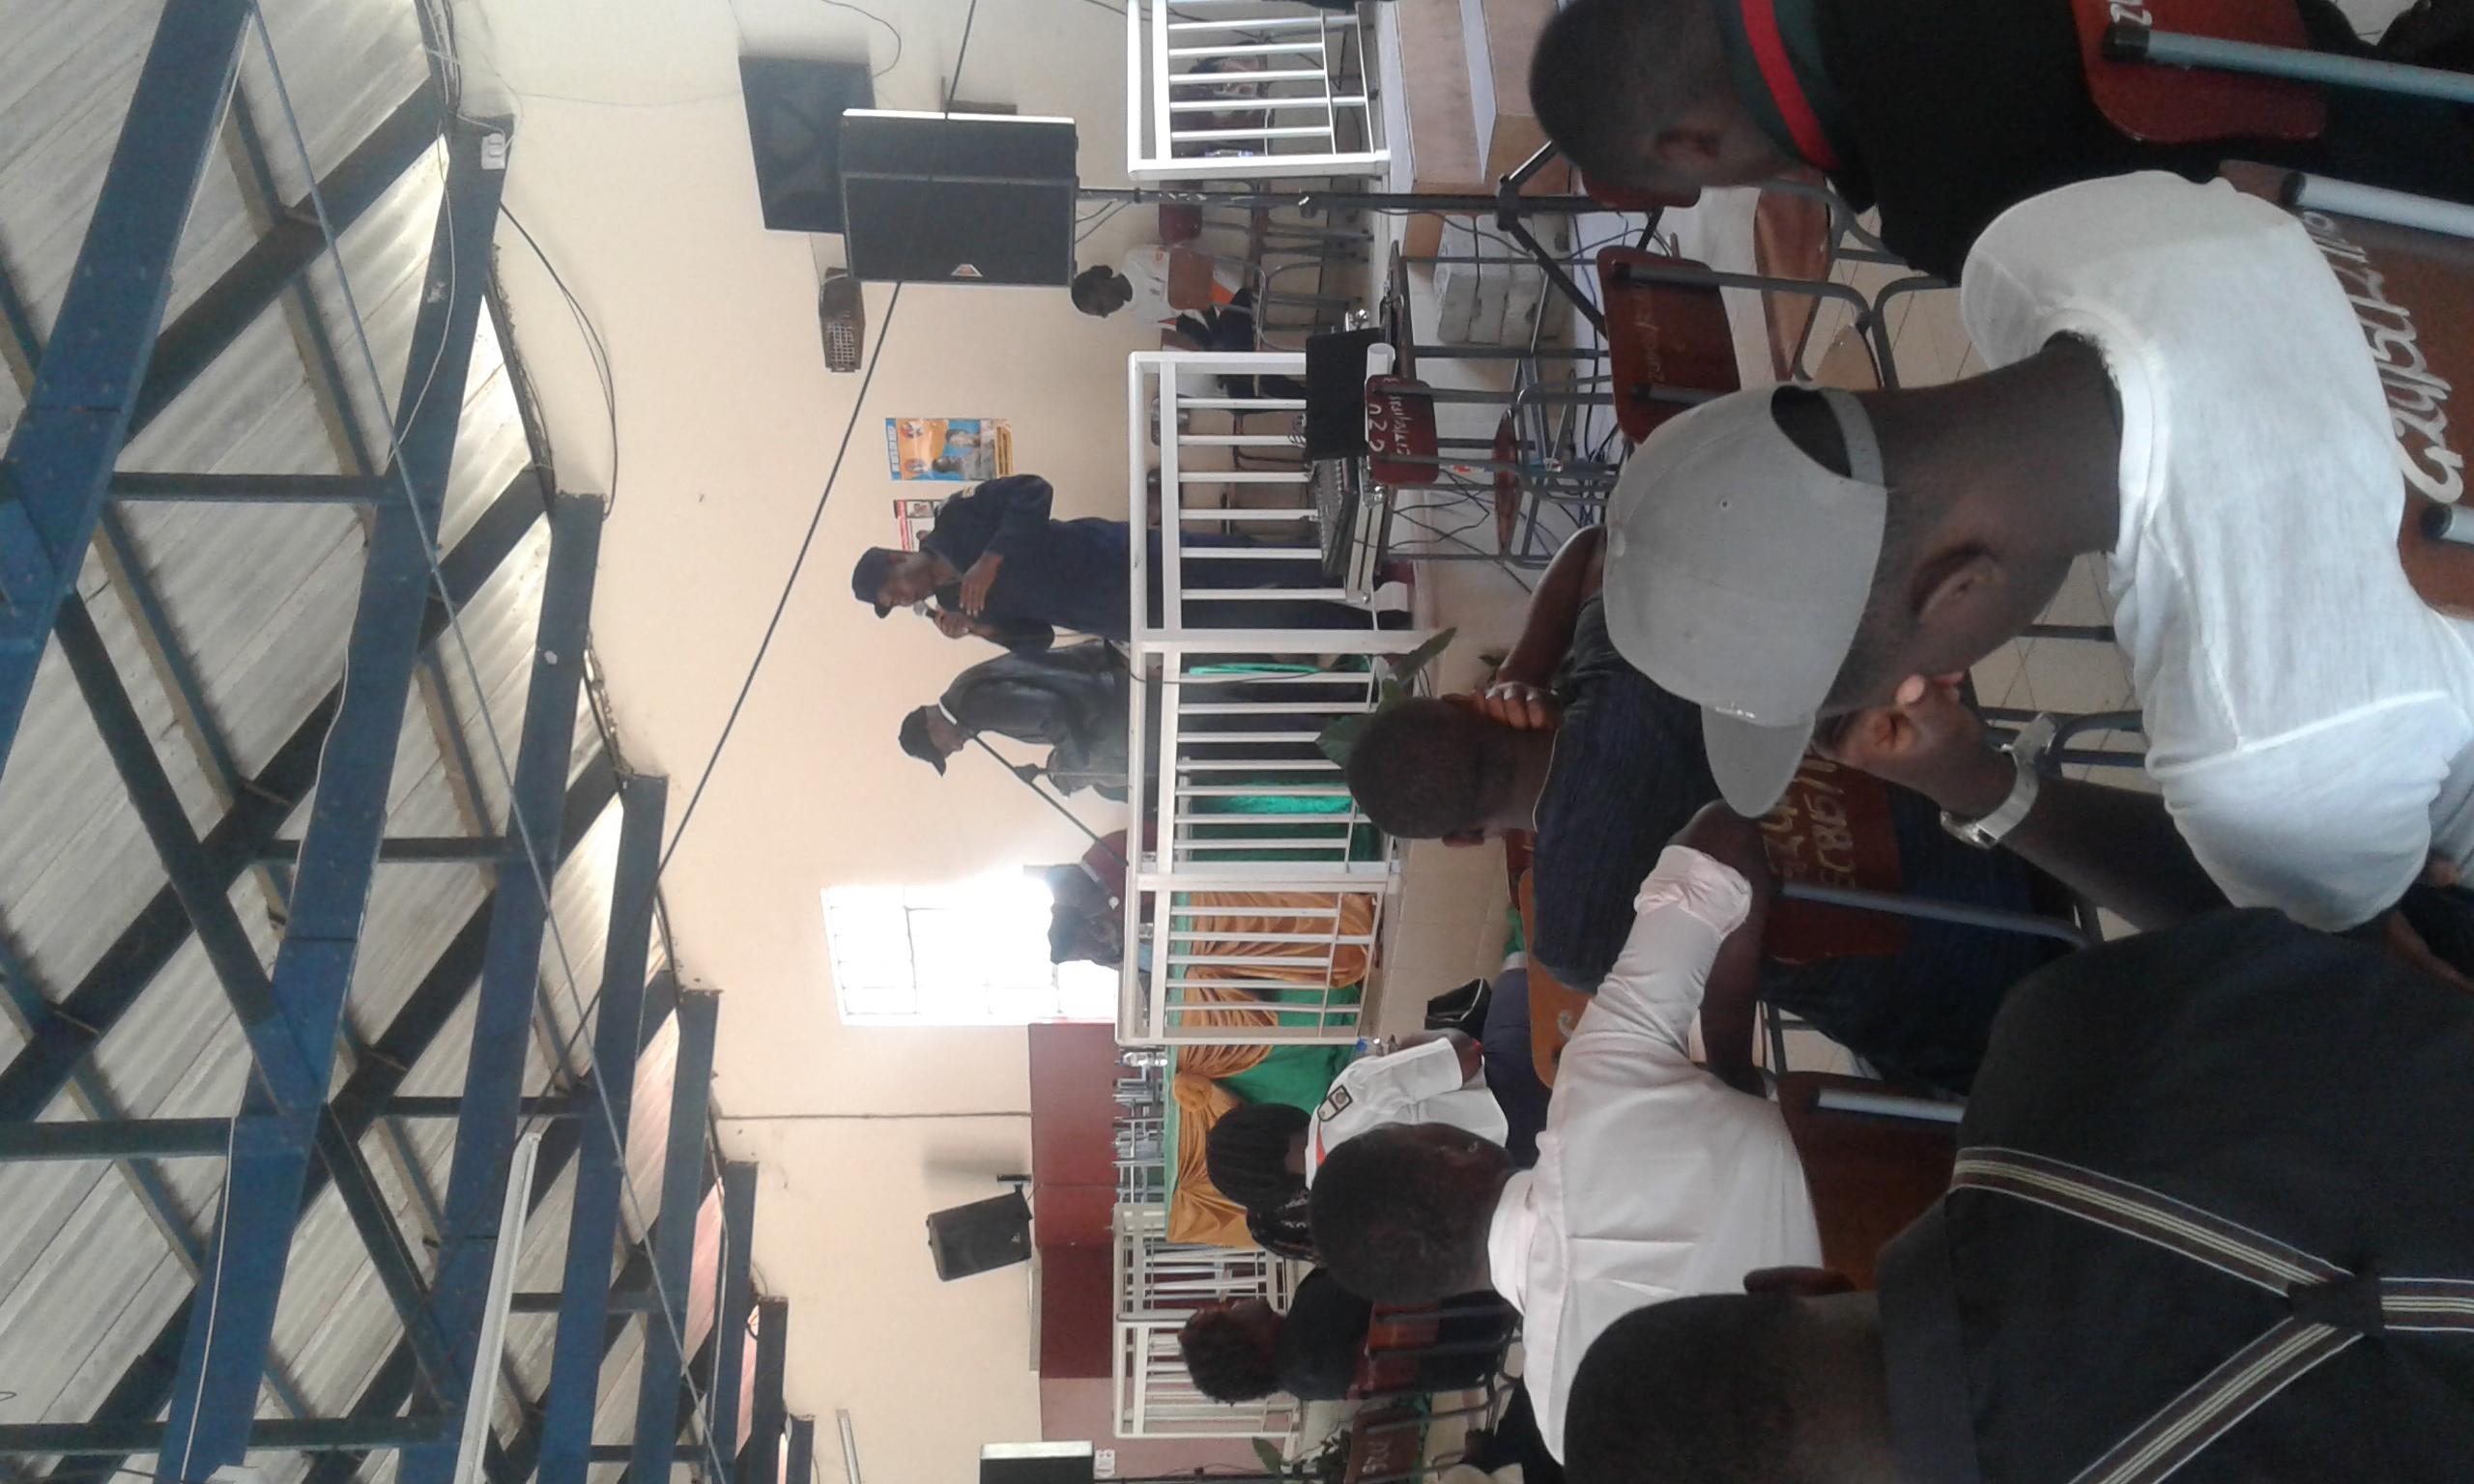 File:GREAT ZIMBABWE UNIVERSITY PEER EDUCATORS, ZIMBABWE 06